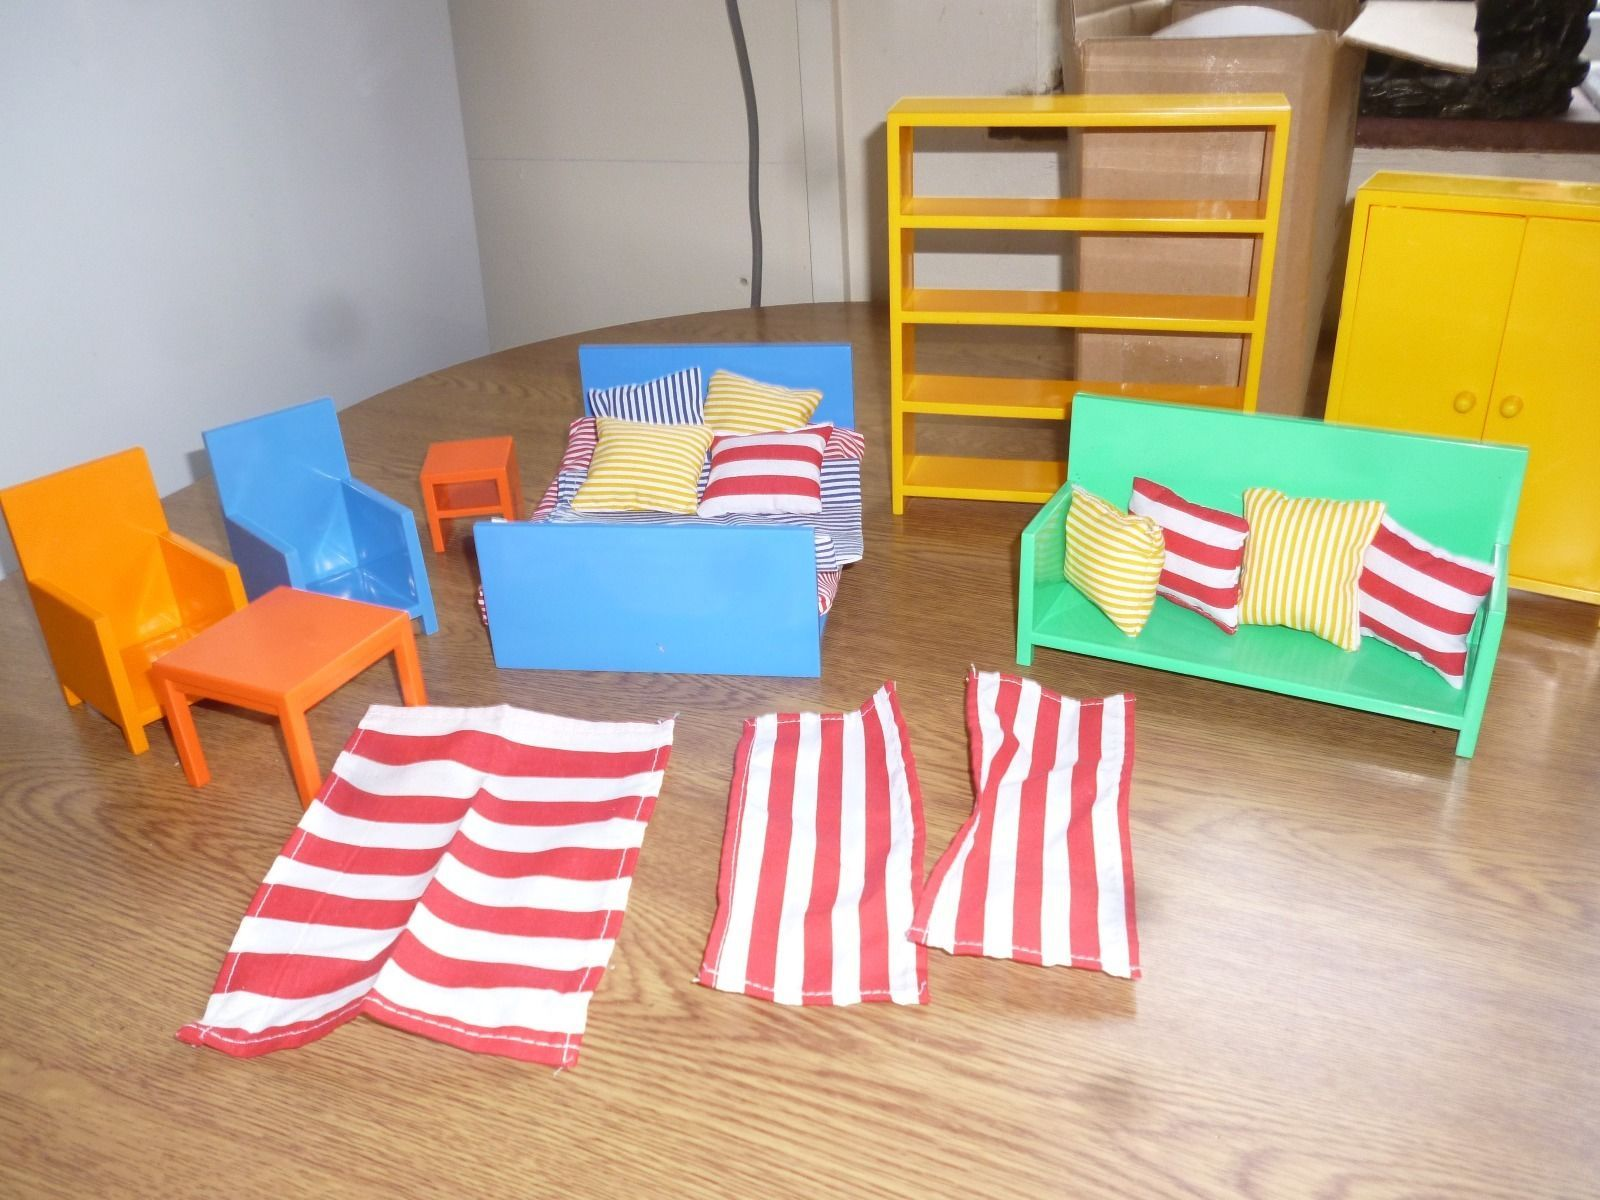 dolls house furniture ikea. Ikea Dolls House Furniture Mixed Bundle | EBay